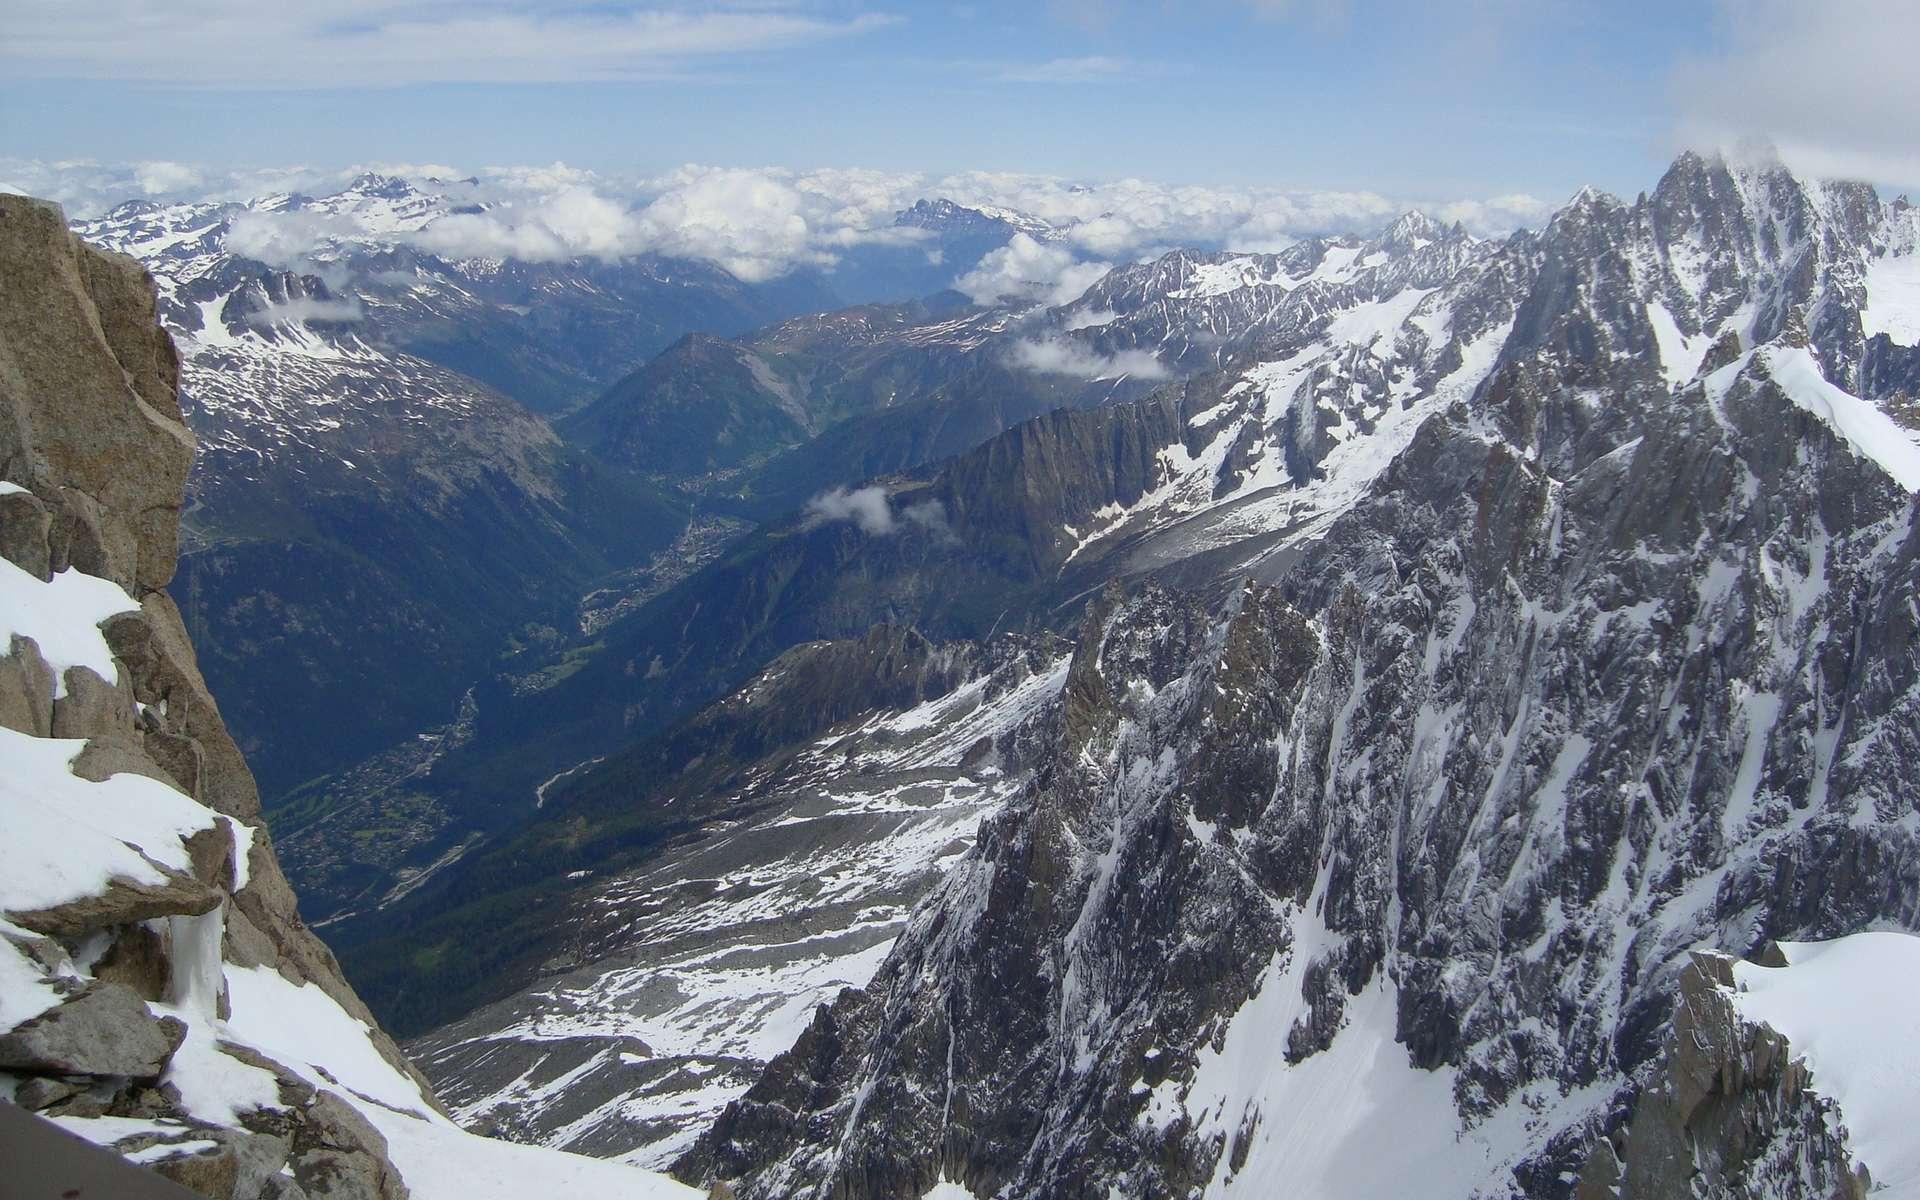 Aiguilles du Midi. © Andy Smedley, imaggeo.egu.eu